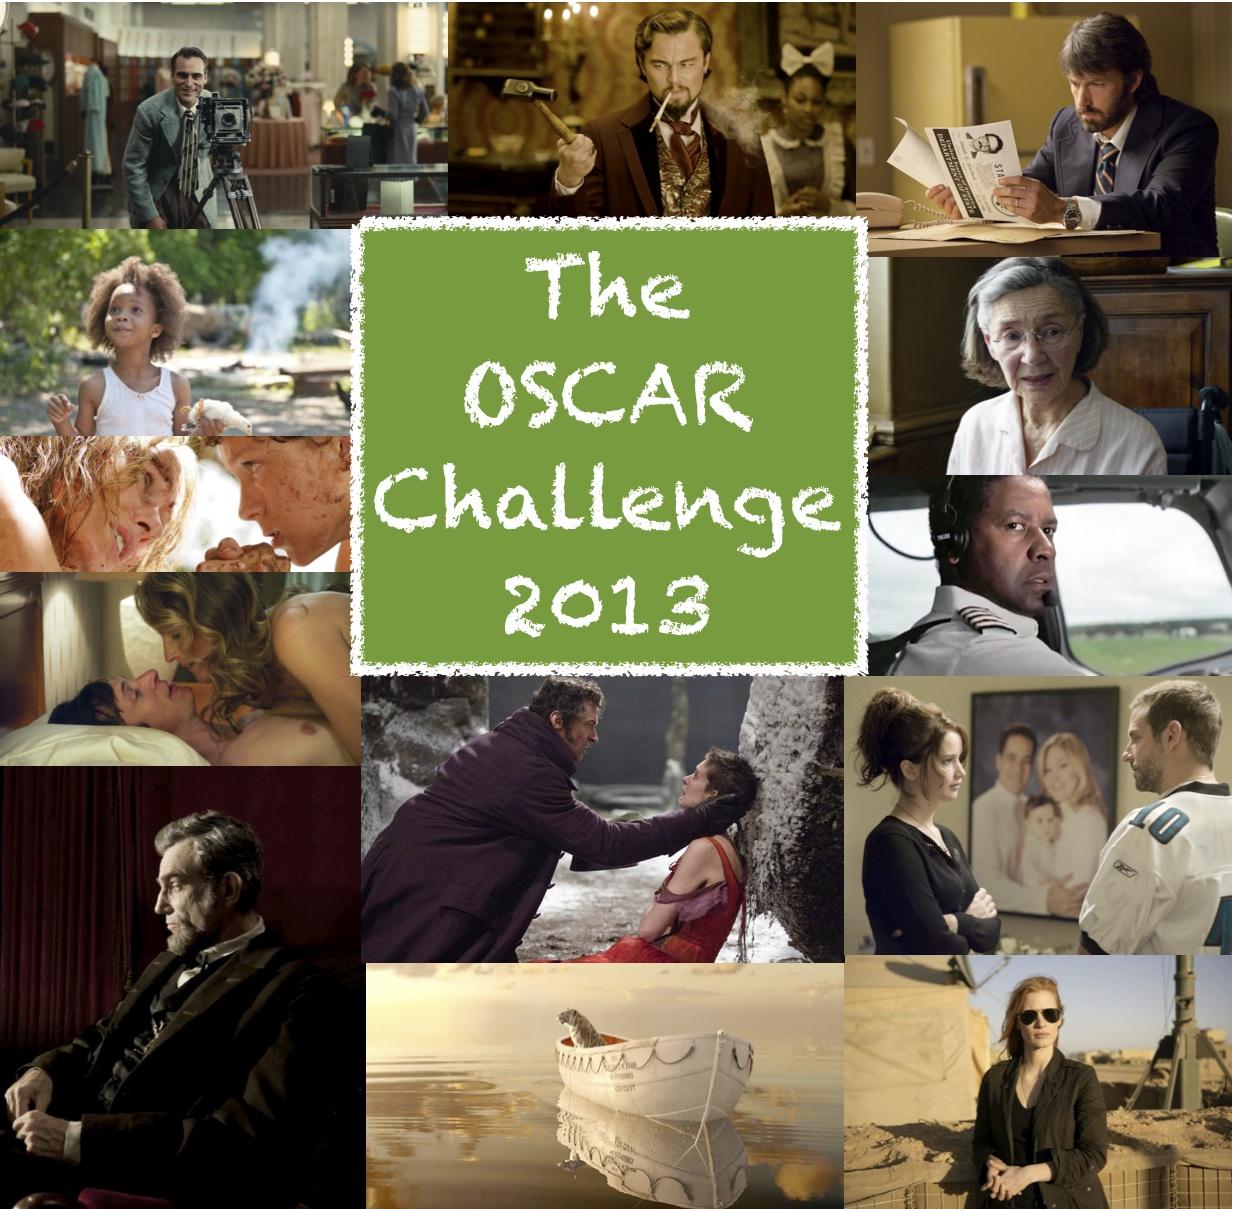 http://4.bp.blogspot.com/-aTXYLf-RtM0/UPrbHCm_aRI/AAAAAAAAGH0/te_10eA_0Zs/s1600/Oscar+Challenge.jpg